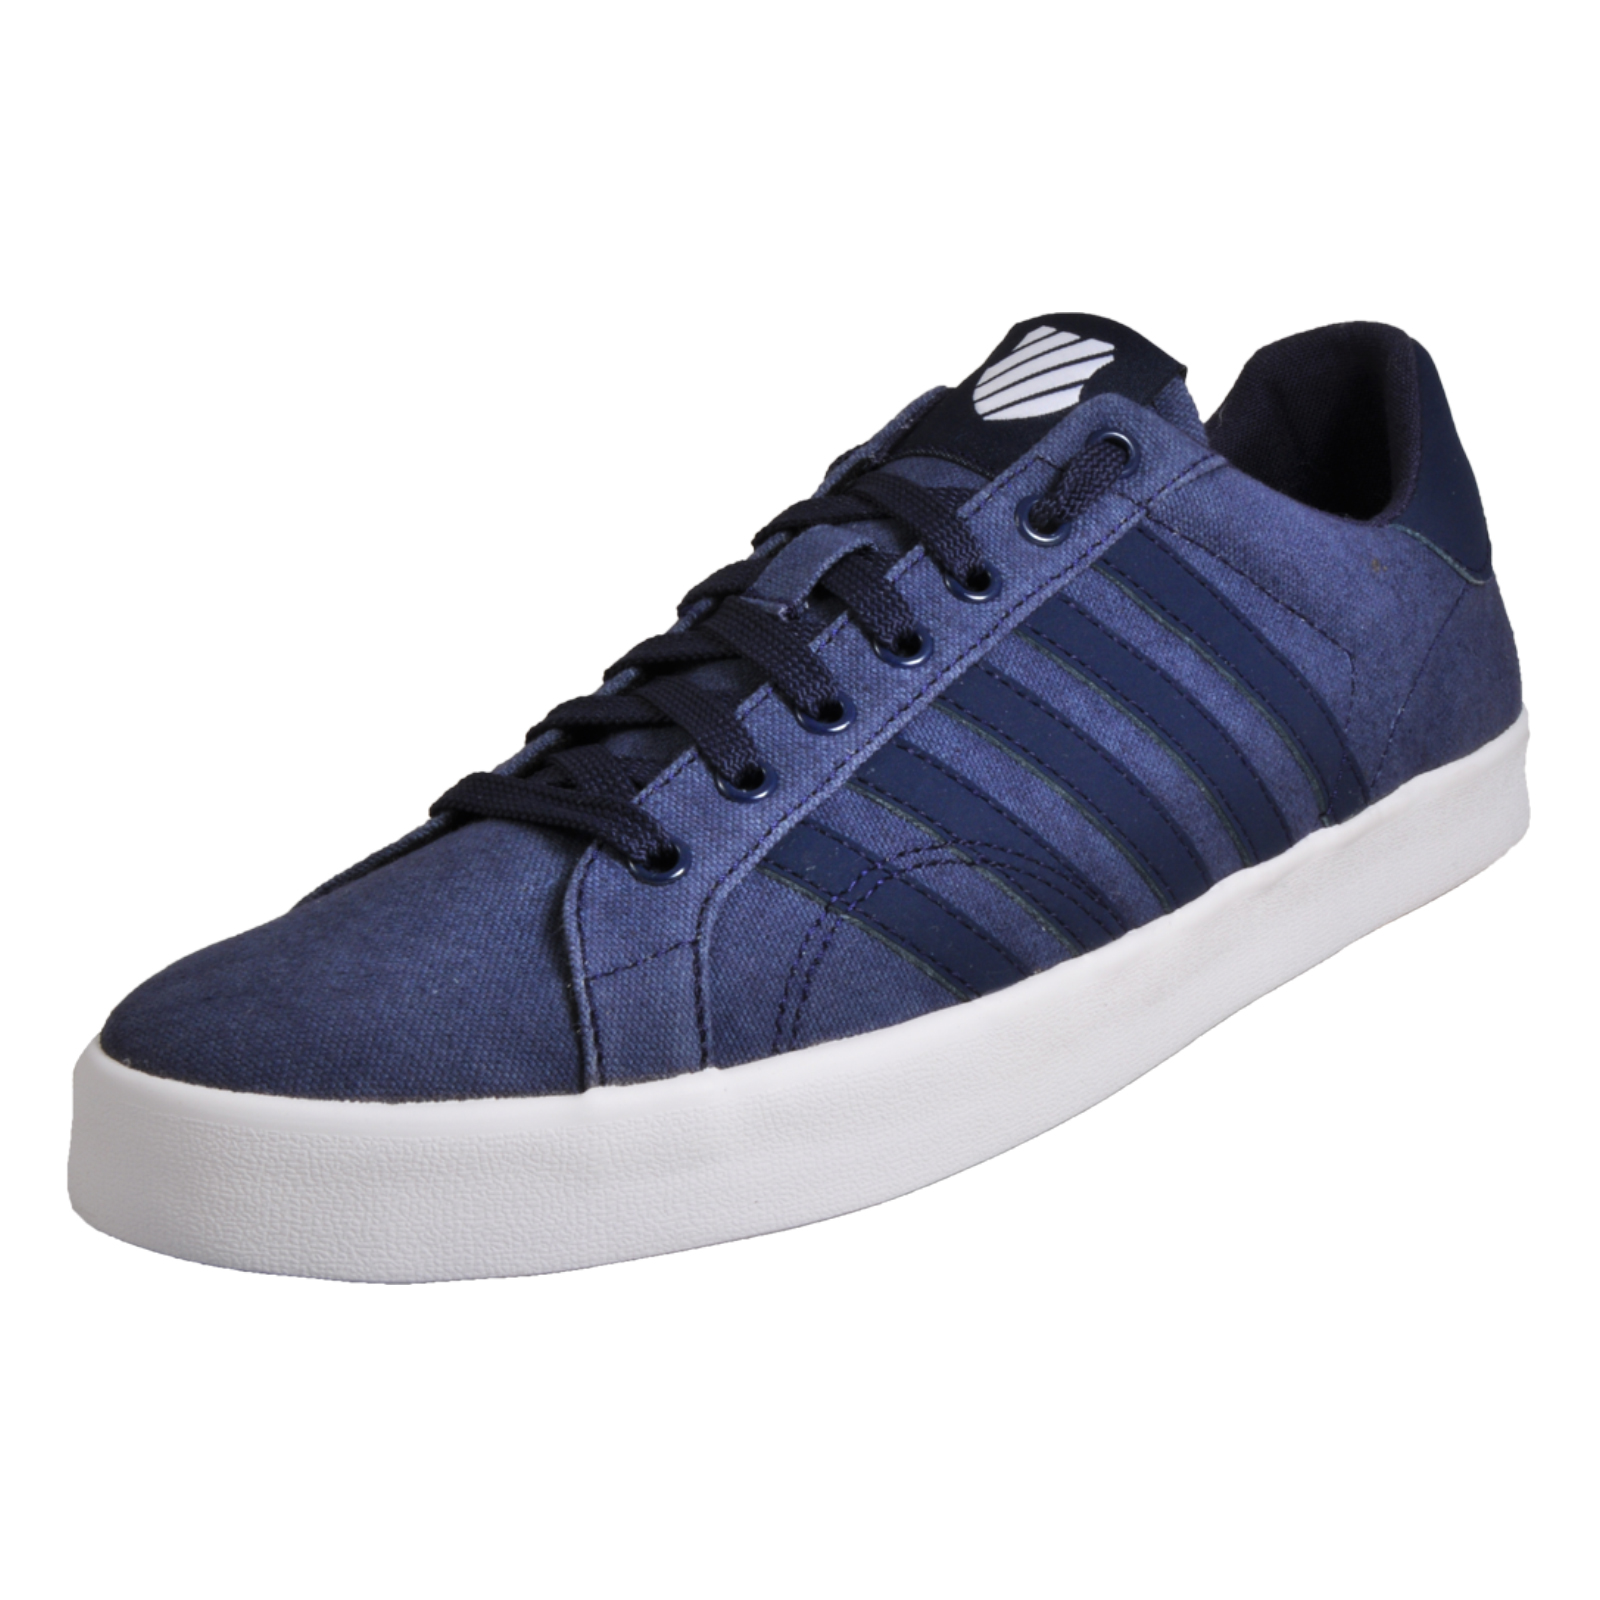 RRP MASERATI Men/'s Straight Leg Dark Blue Denim Jeans By SK5 Style £35